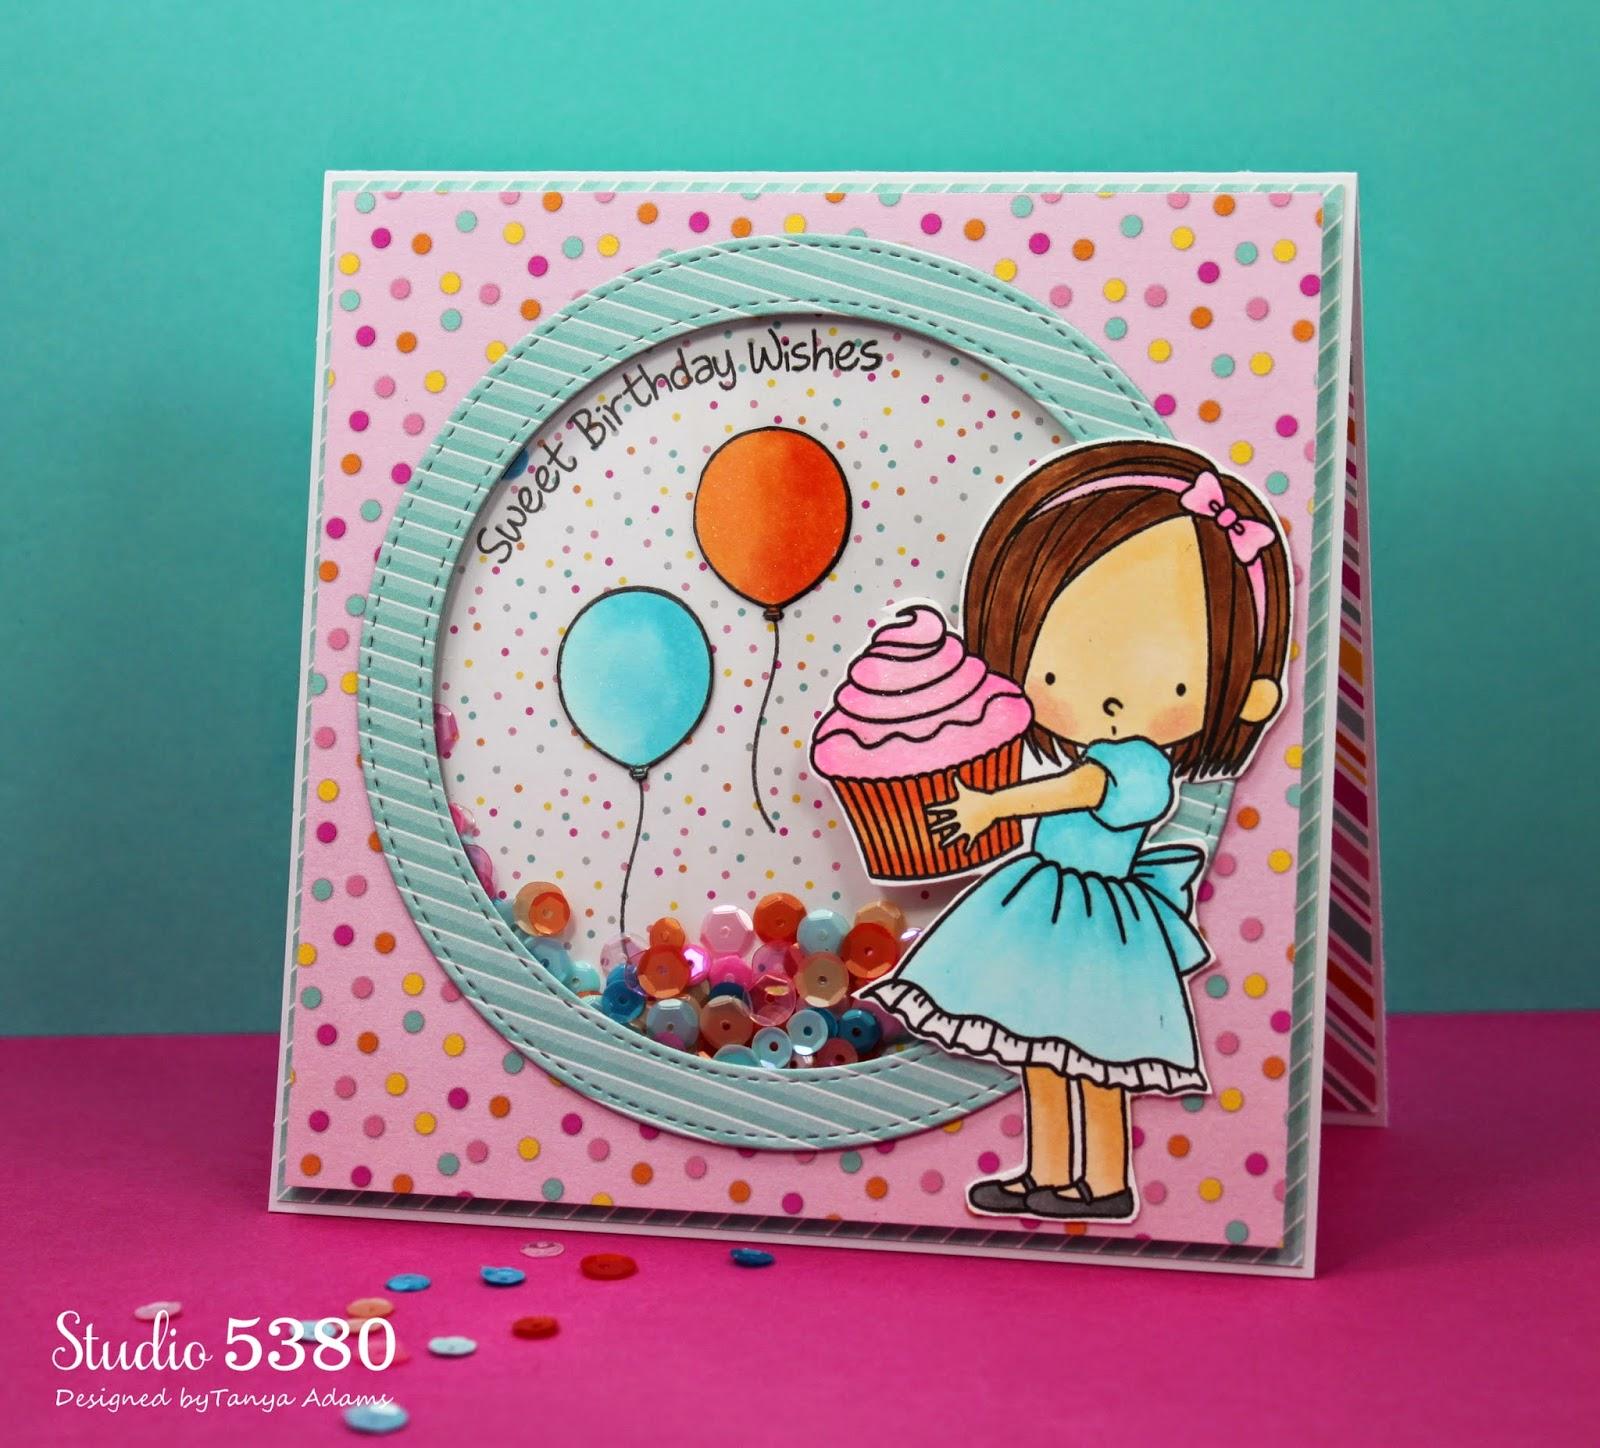 Studio 5380 Sweet Birthday Wishes For Hannah